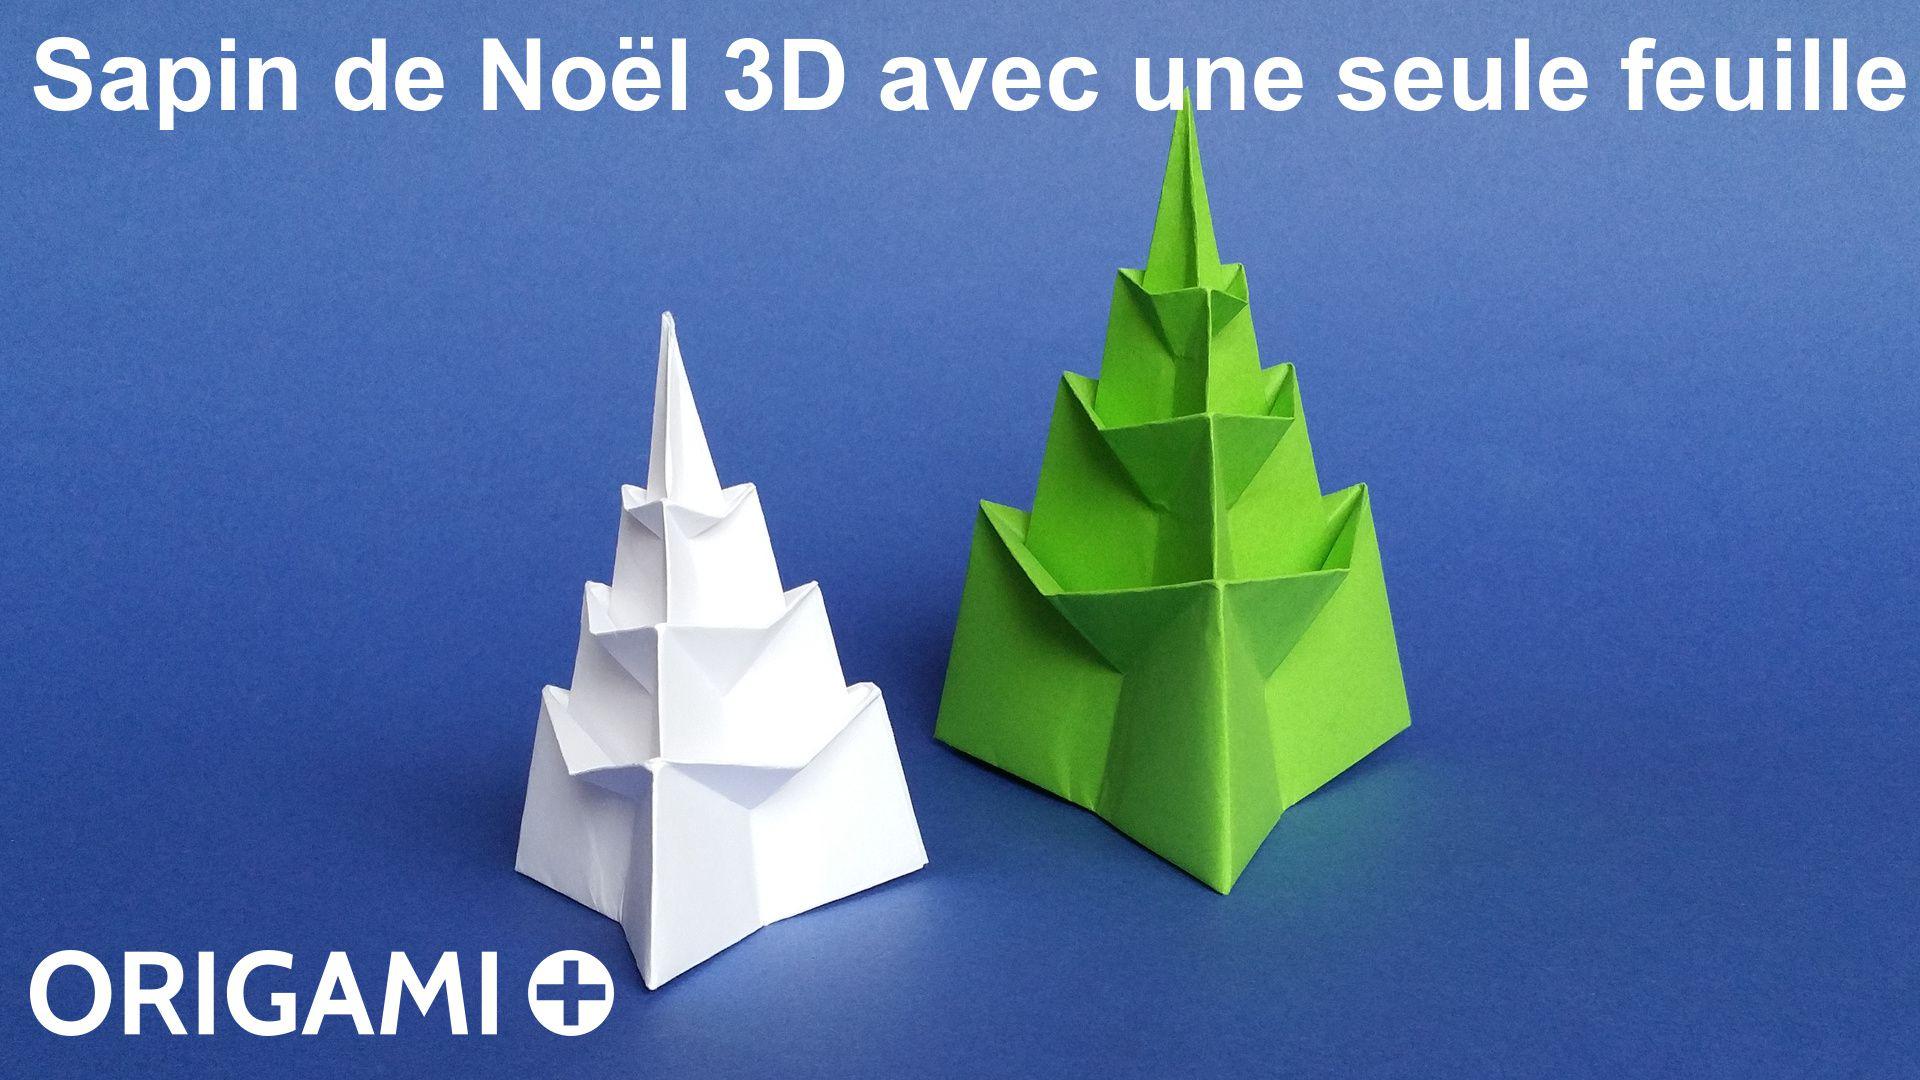 Sapin De Noël 3D Avec Une Seule Feuille En Origami à Origami Sapin De Noel